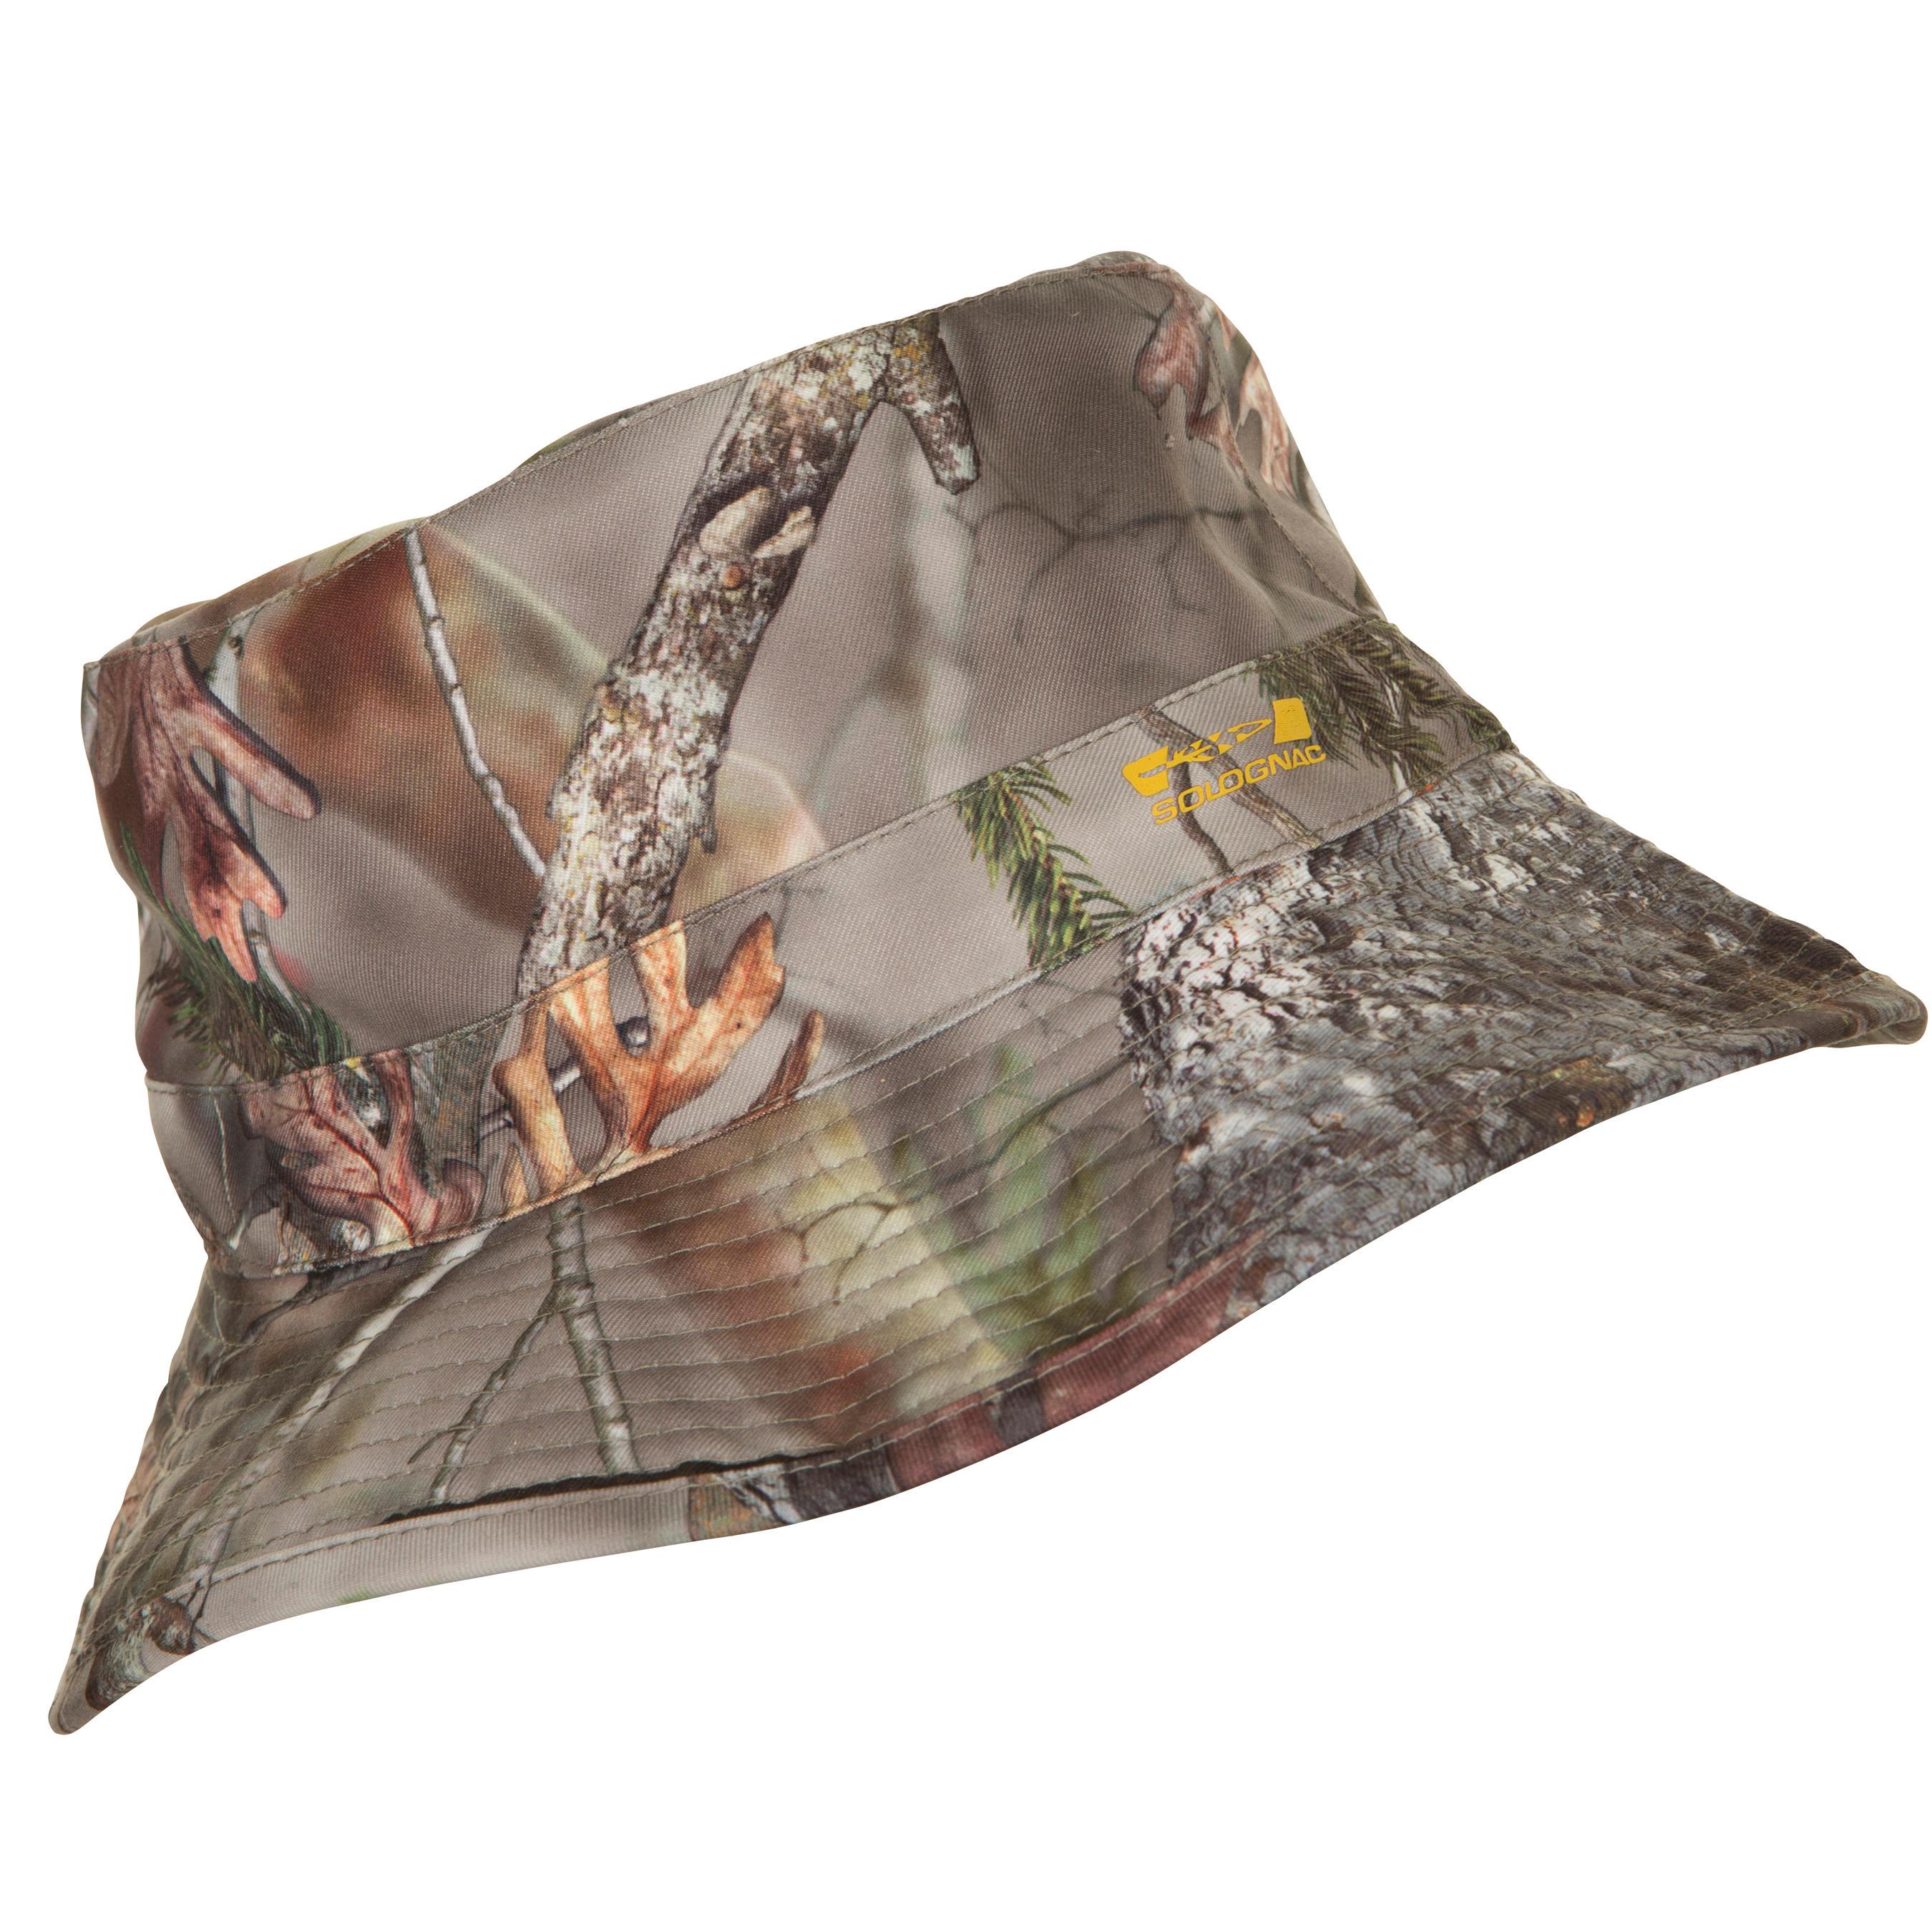 Solognac Keerbaar hoedje Actikam 100 camouflage bruin